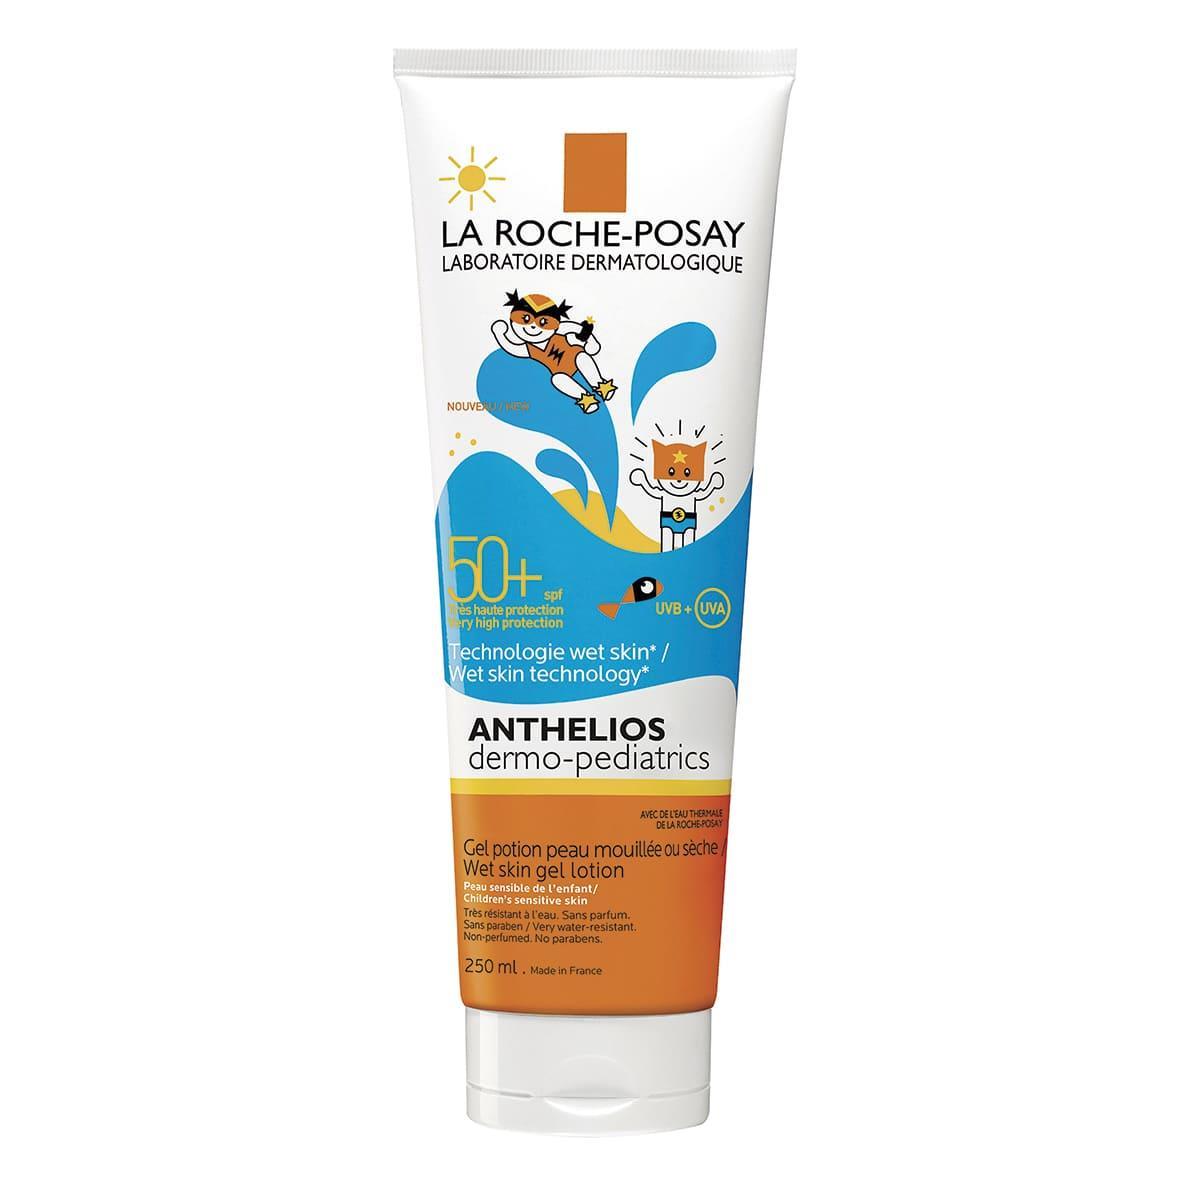 Anthelios Dermopediatrics Crema Wet Skin 250Ml